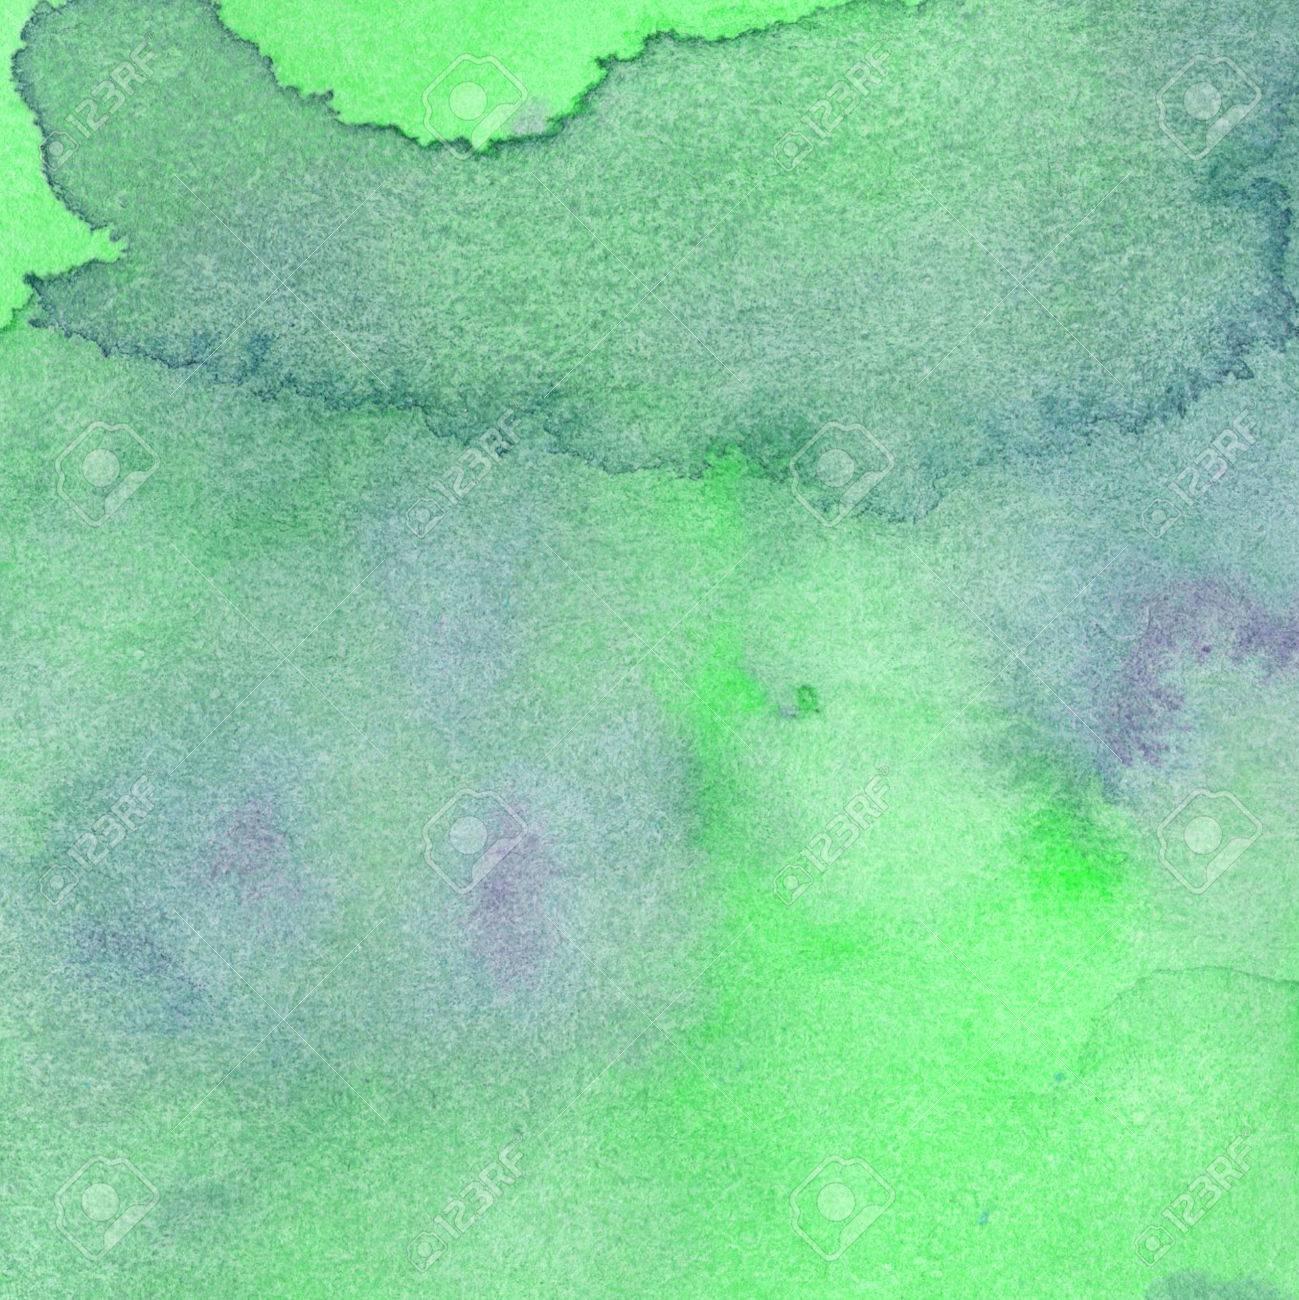 1299x1300 66757541 Watercolor Texture Transparent Marble Emerald Green Mint